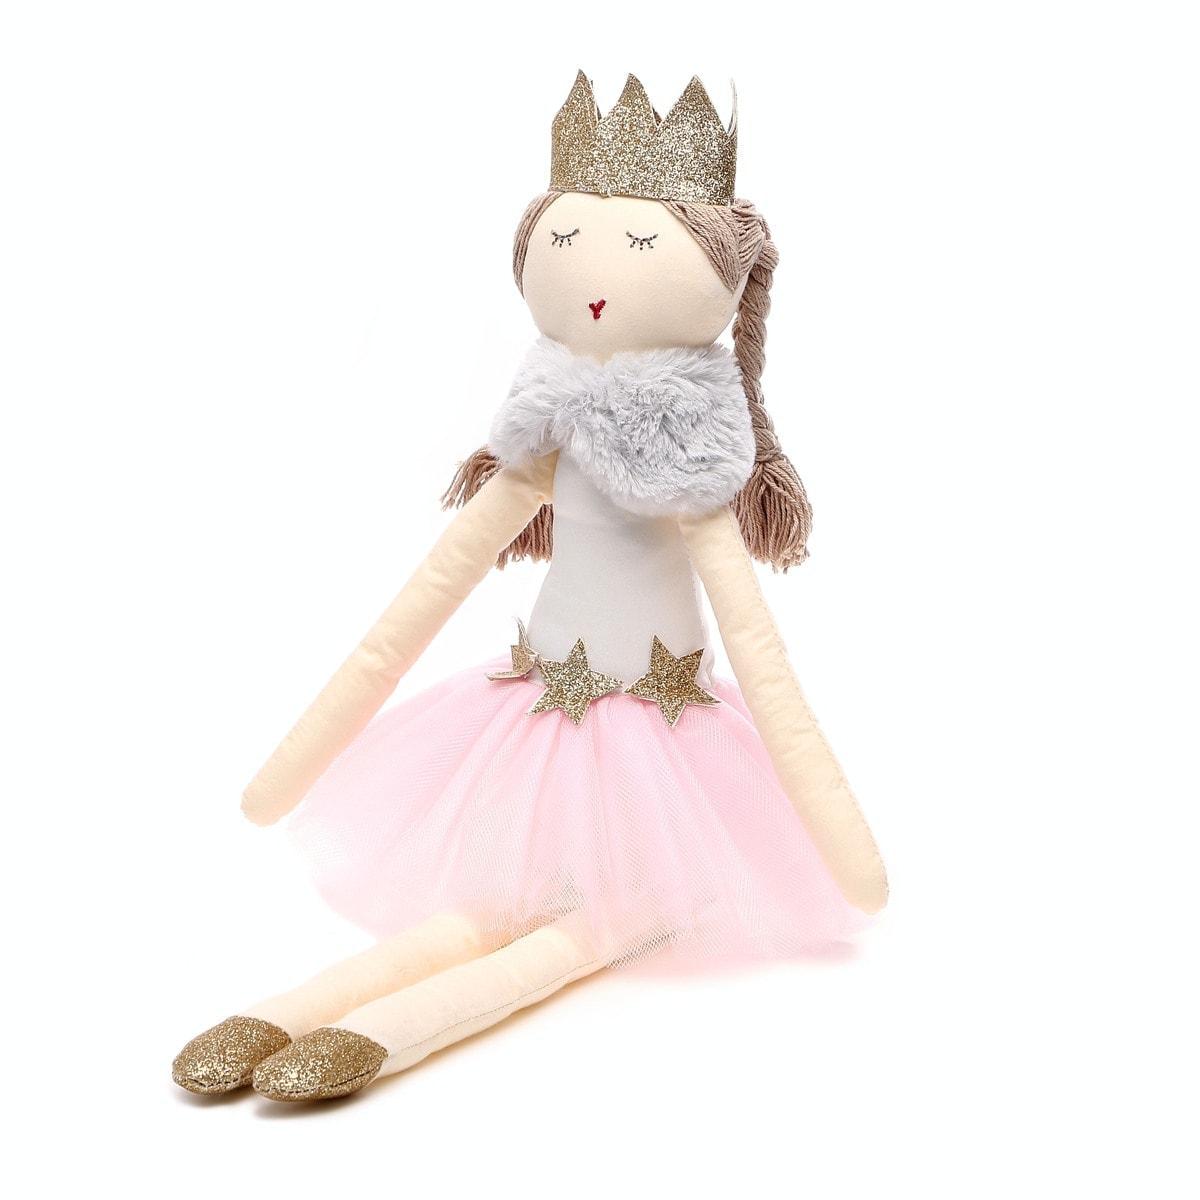 Princess-Sophy